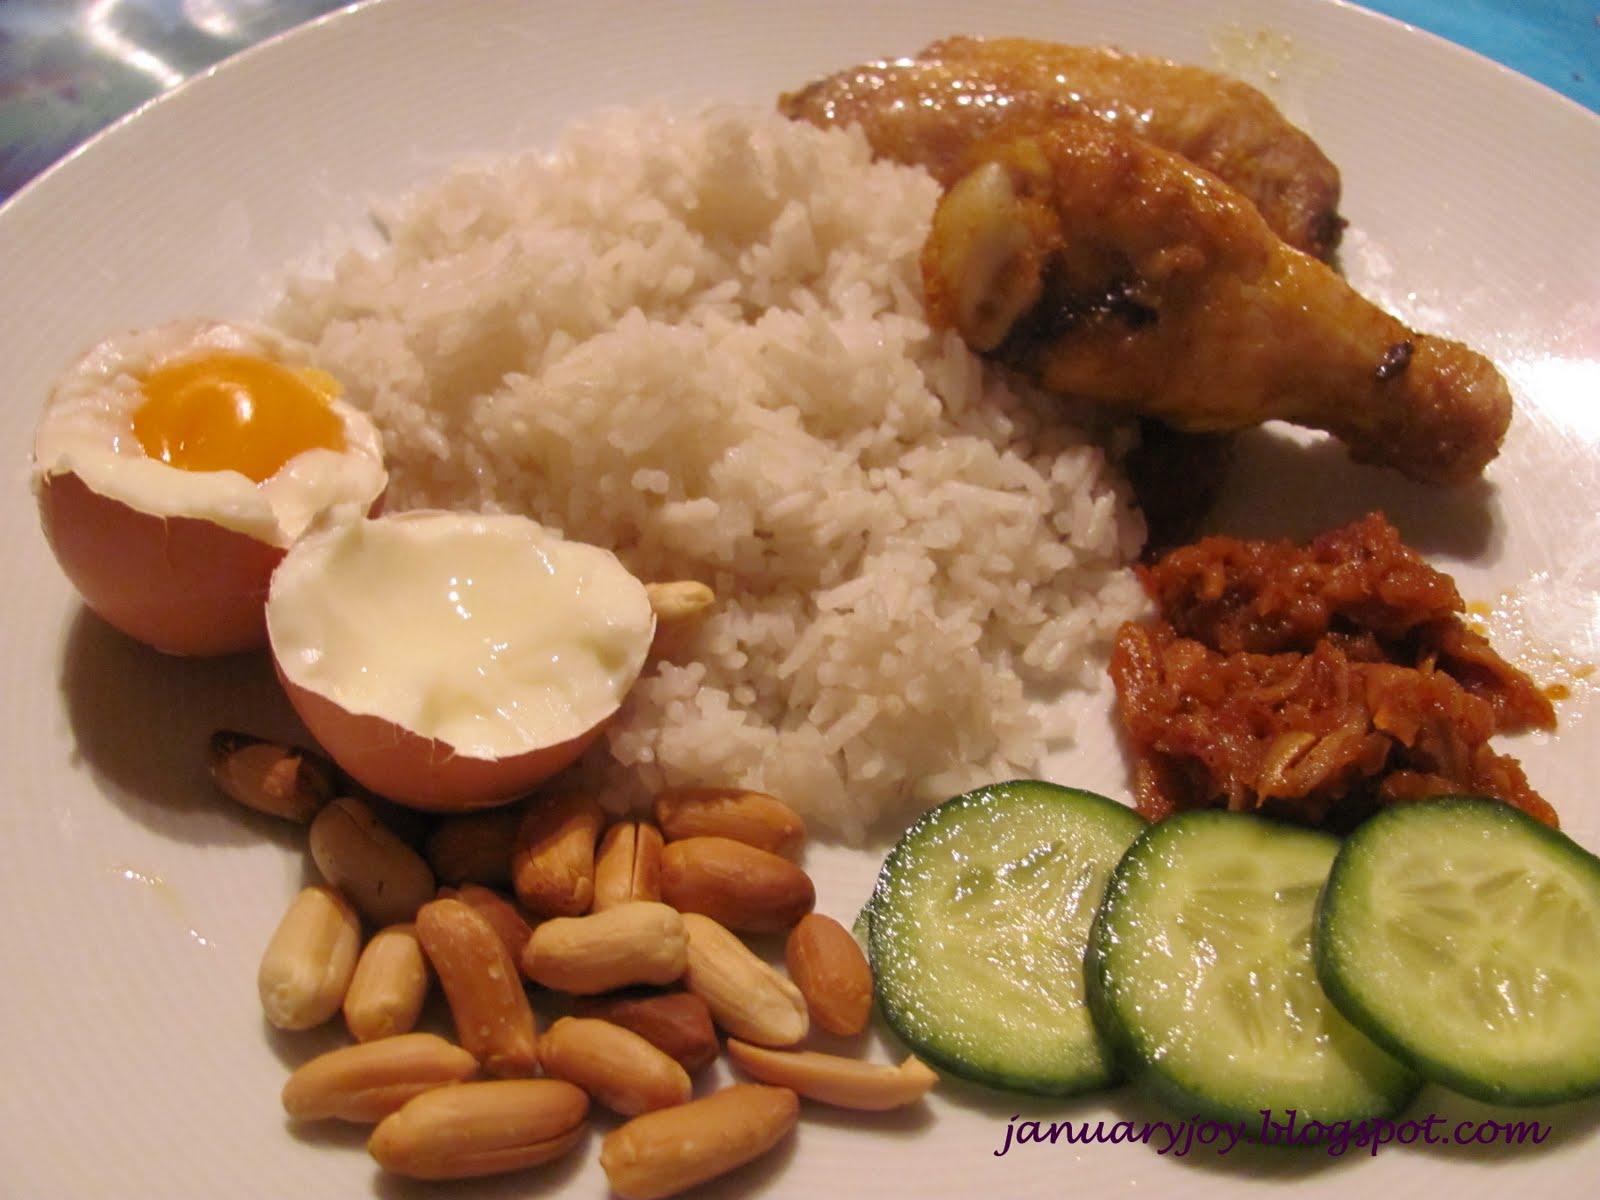 Malaysian Glazed Chicken Wings Recipes — Dishmaps